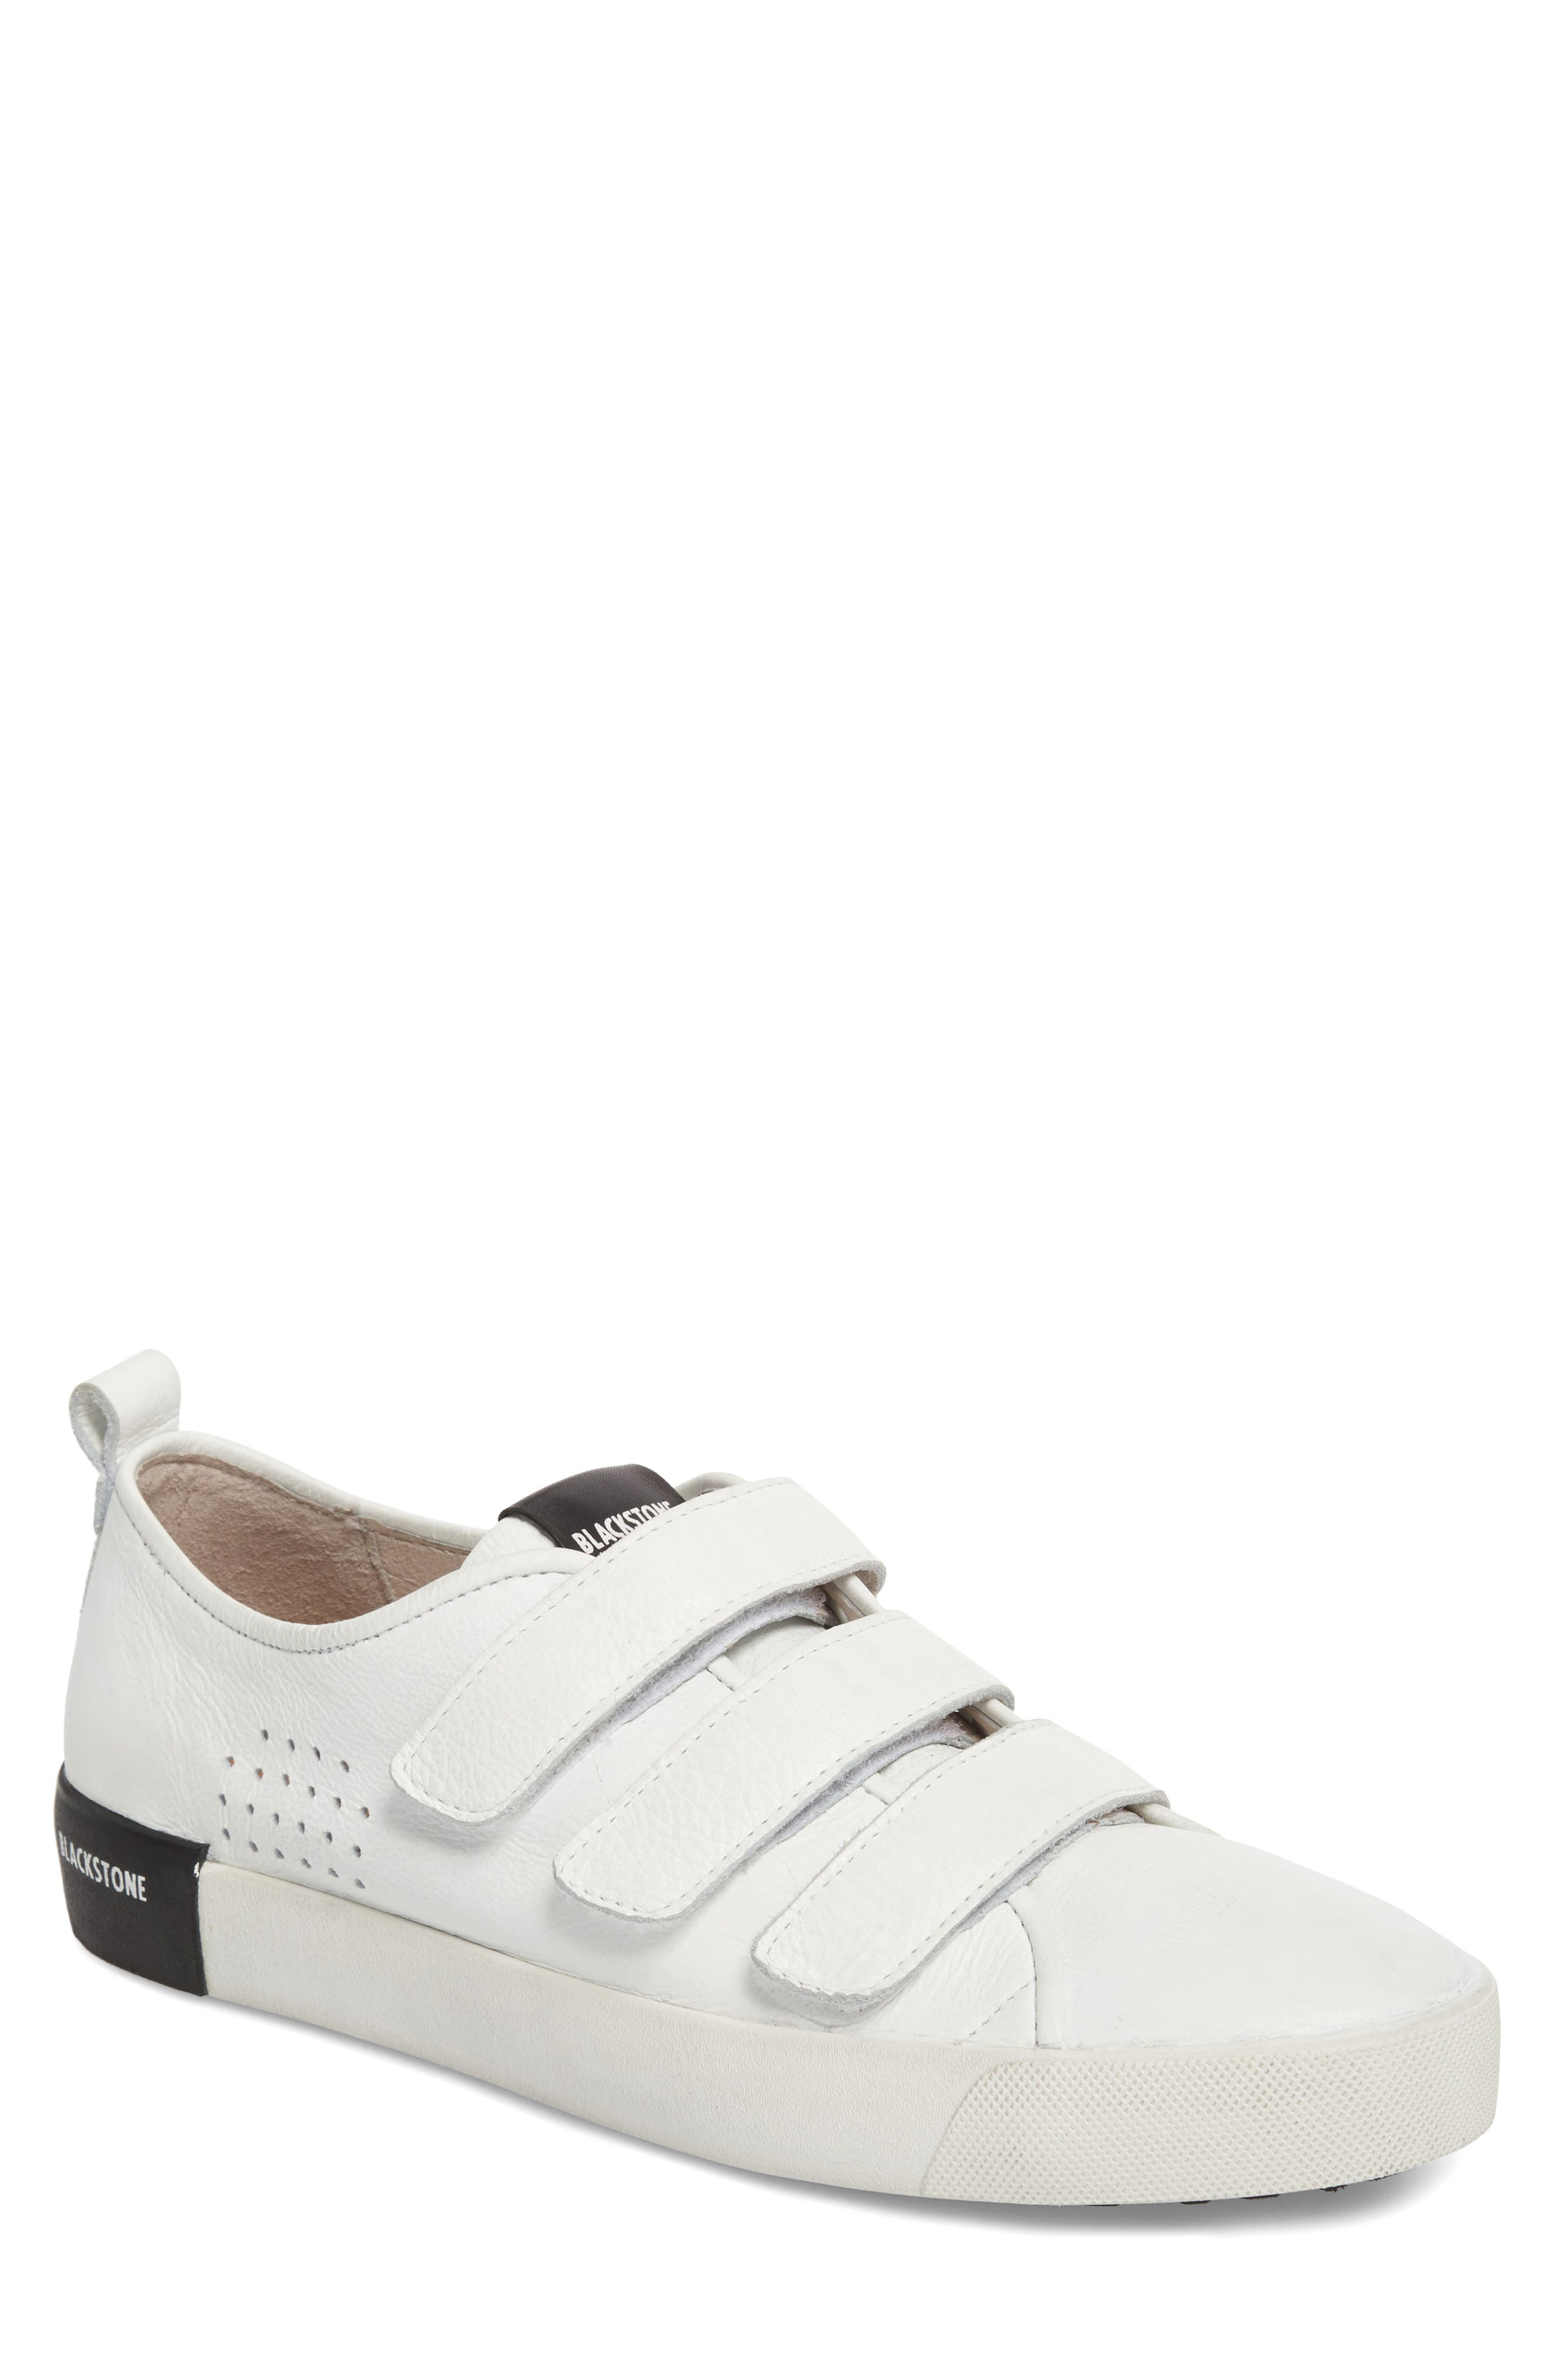 Blackstone PM41 Low Top Sneaker (Men)